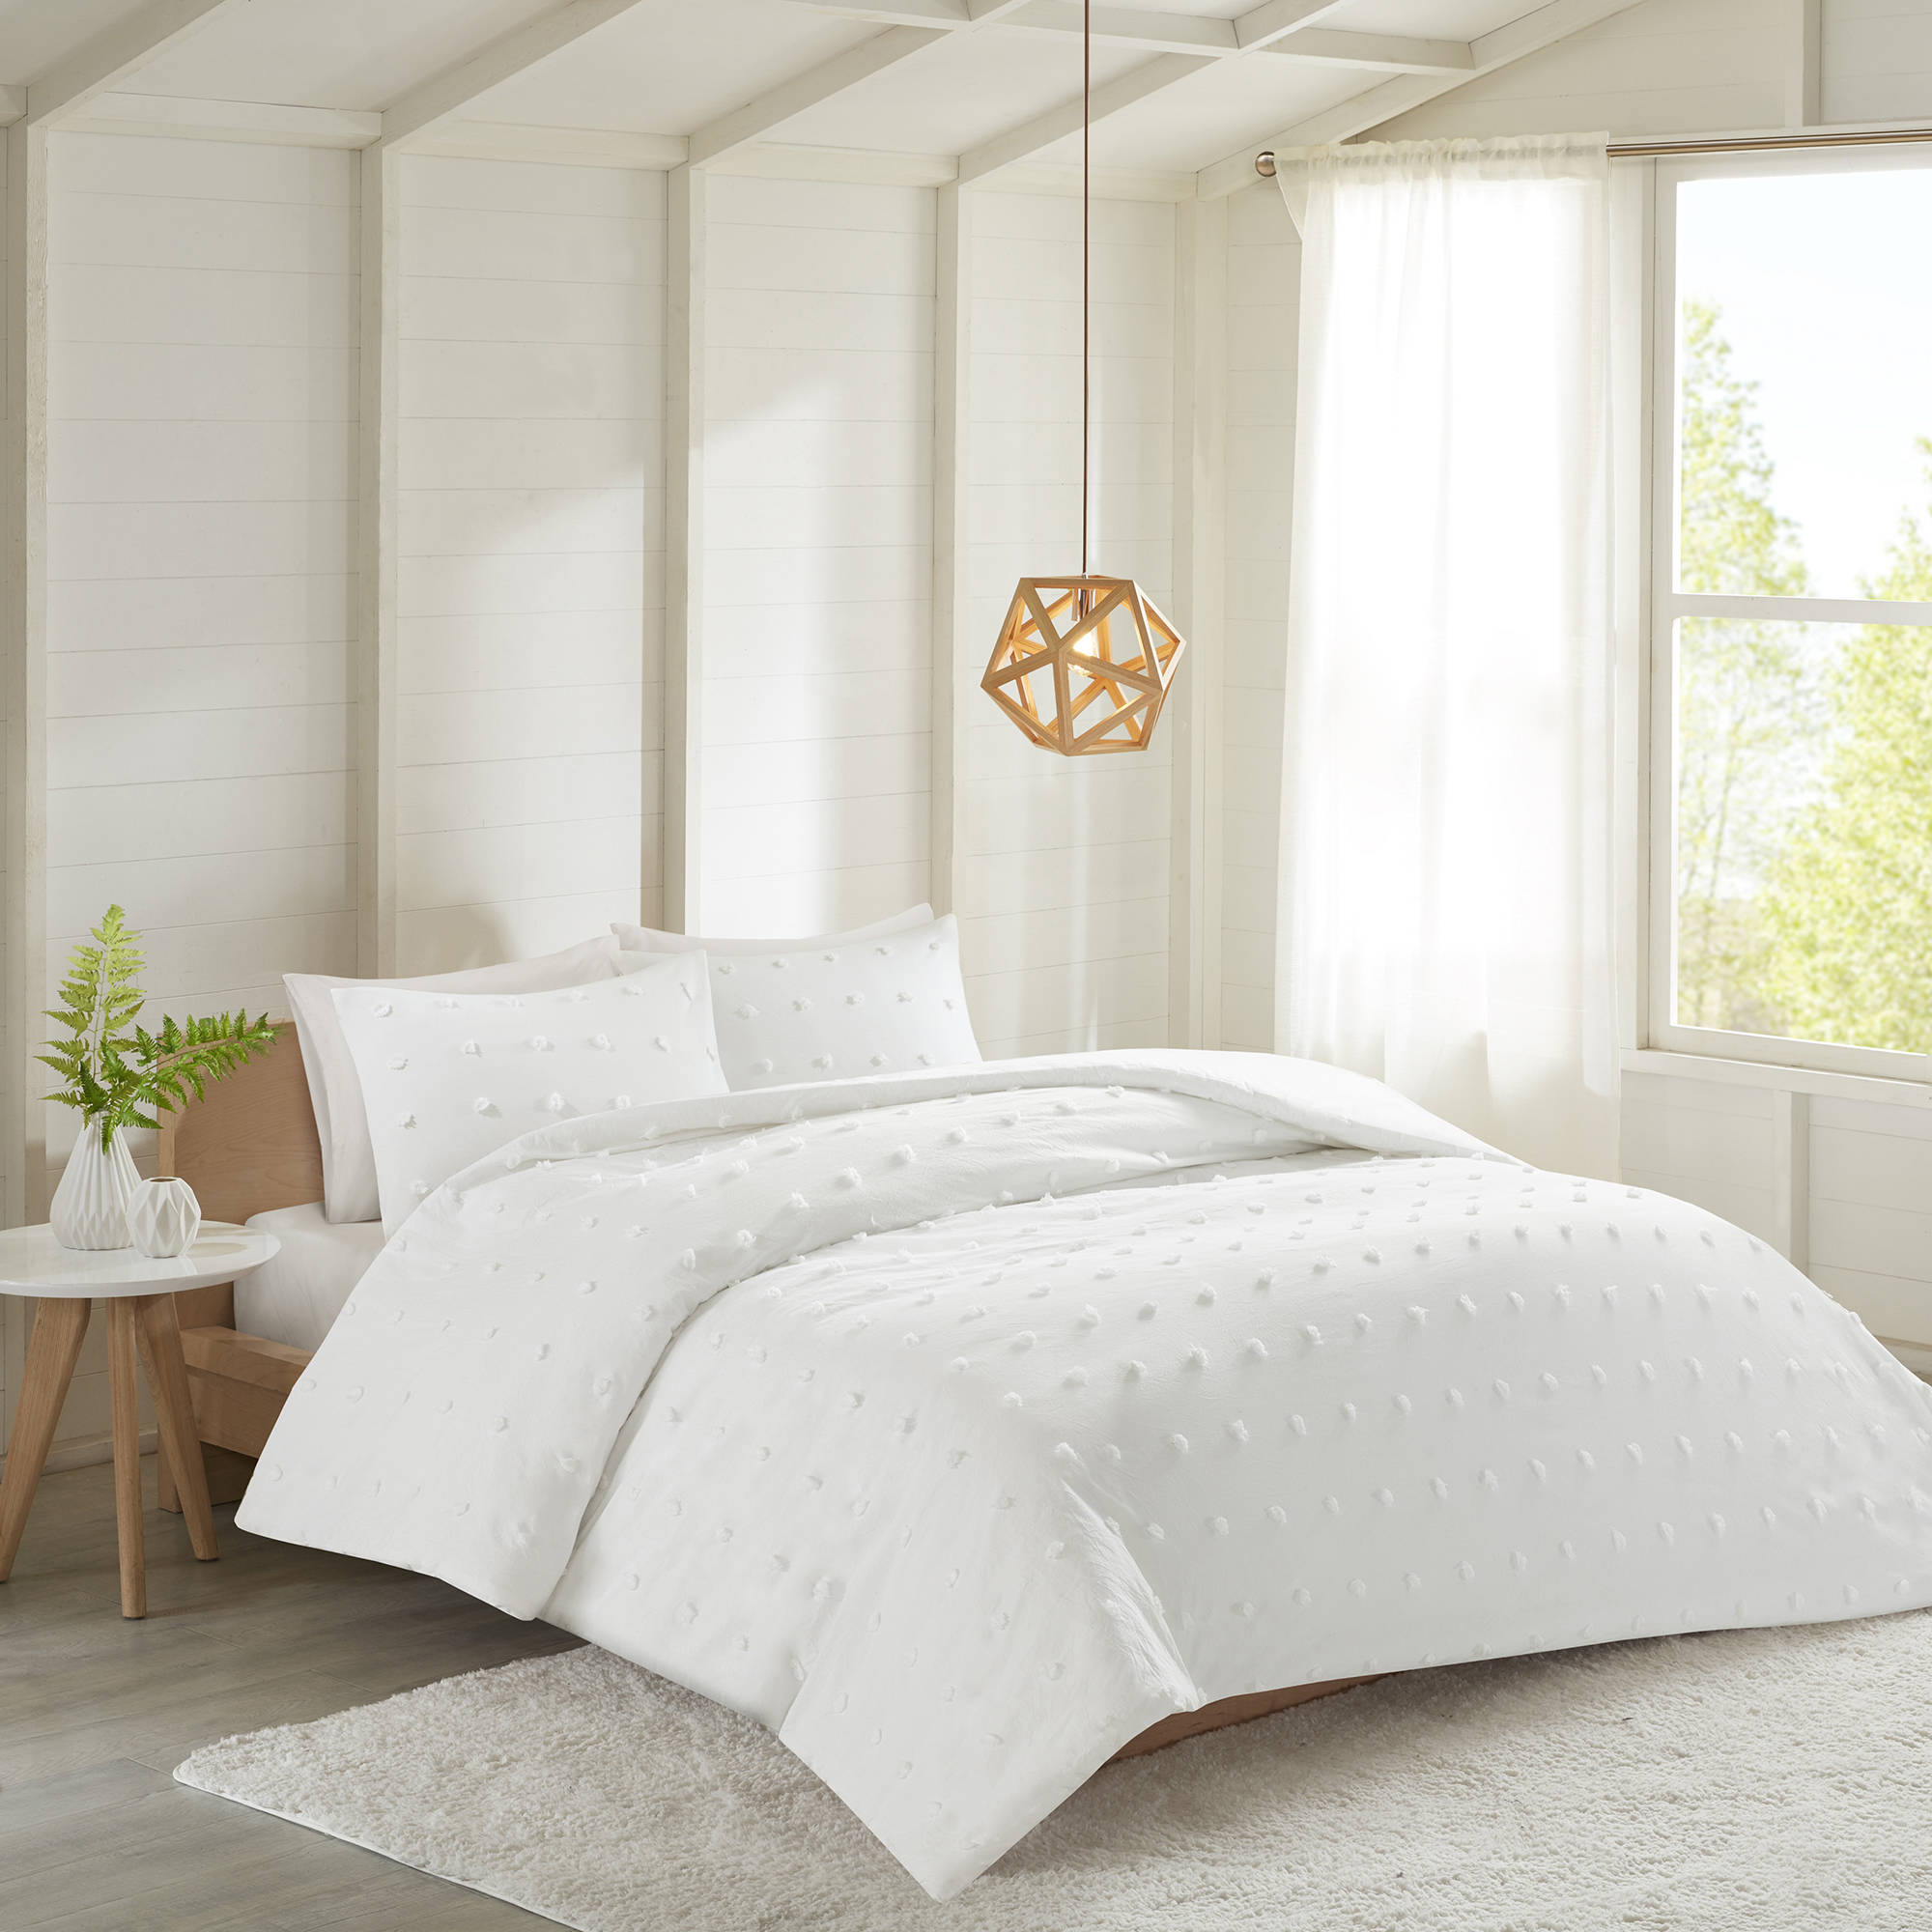 Better Homes And Gardens Woven Dot 3 Piece Comforter Set by Better Homes & Gardens